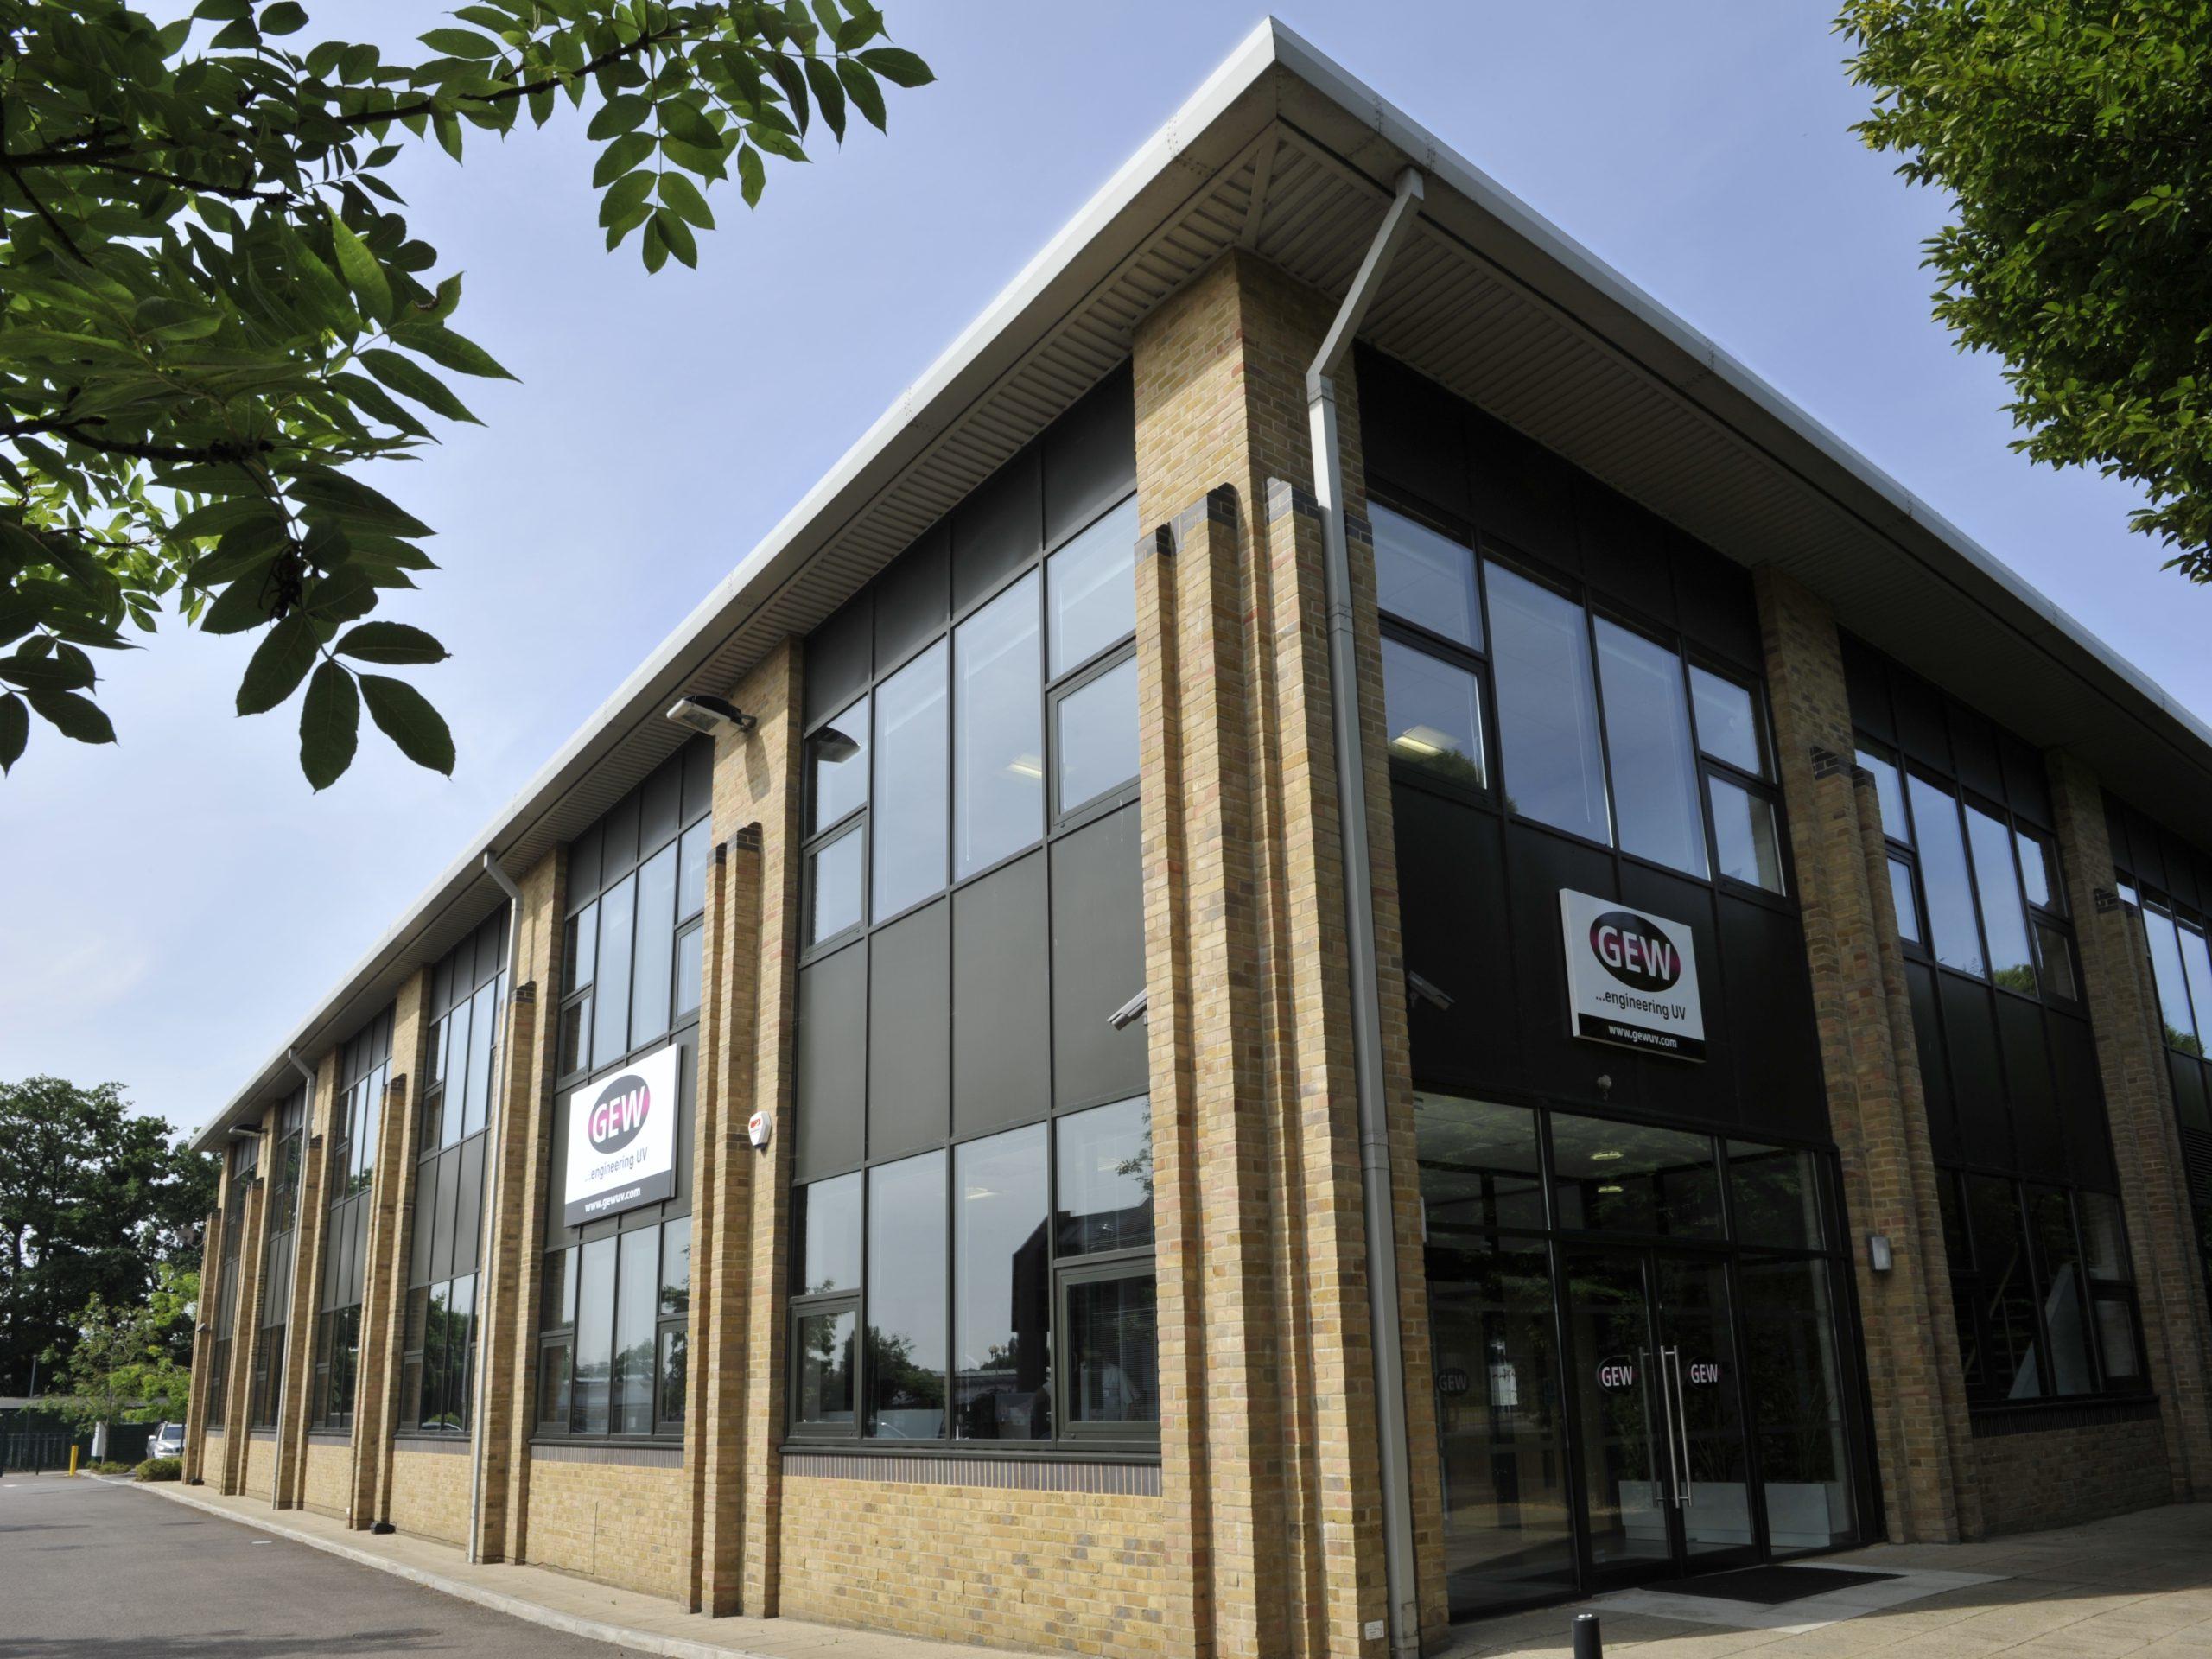 GEW HQ UK